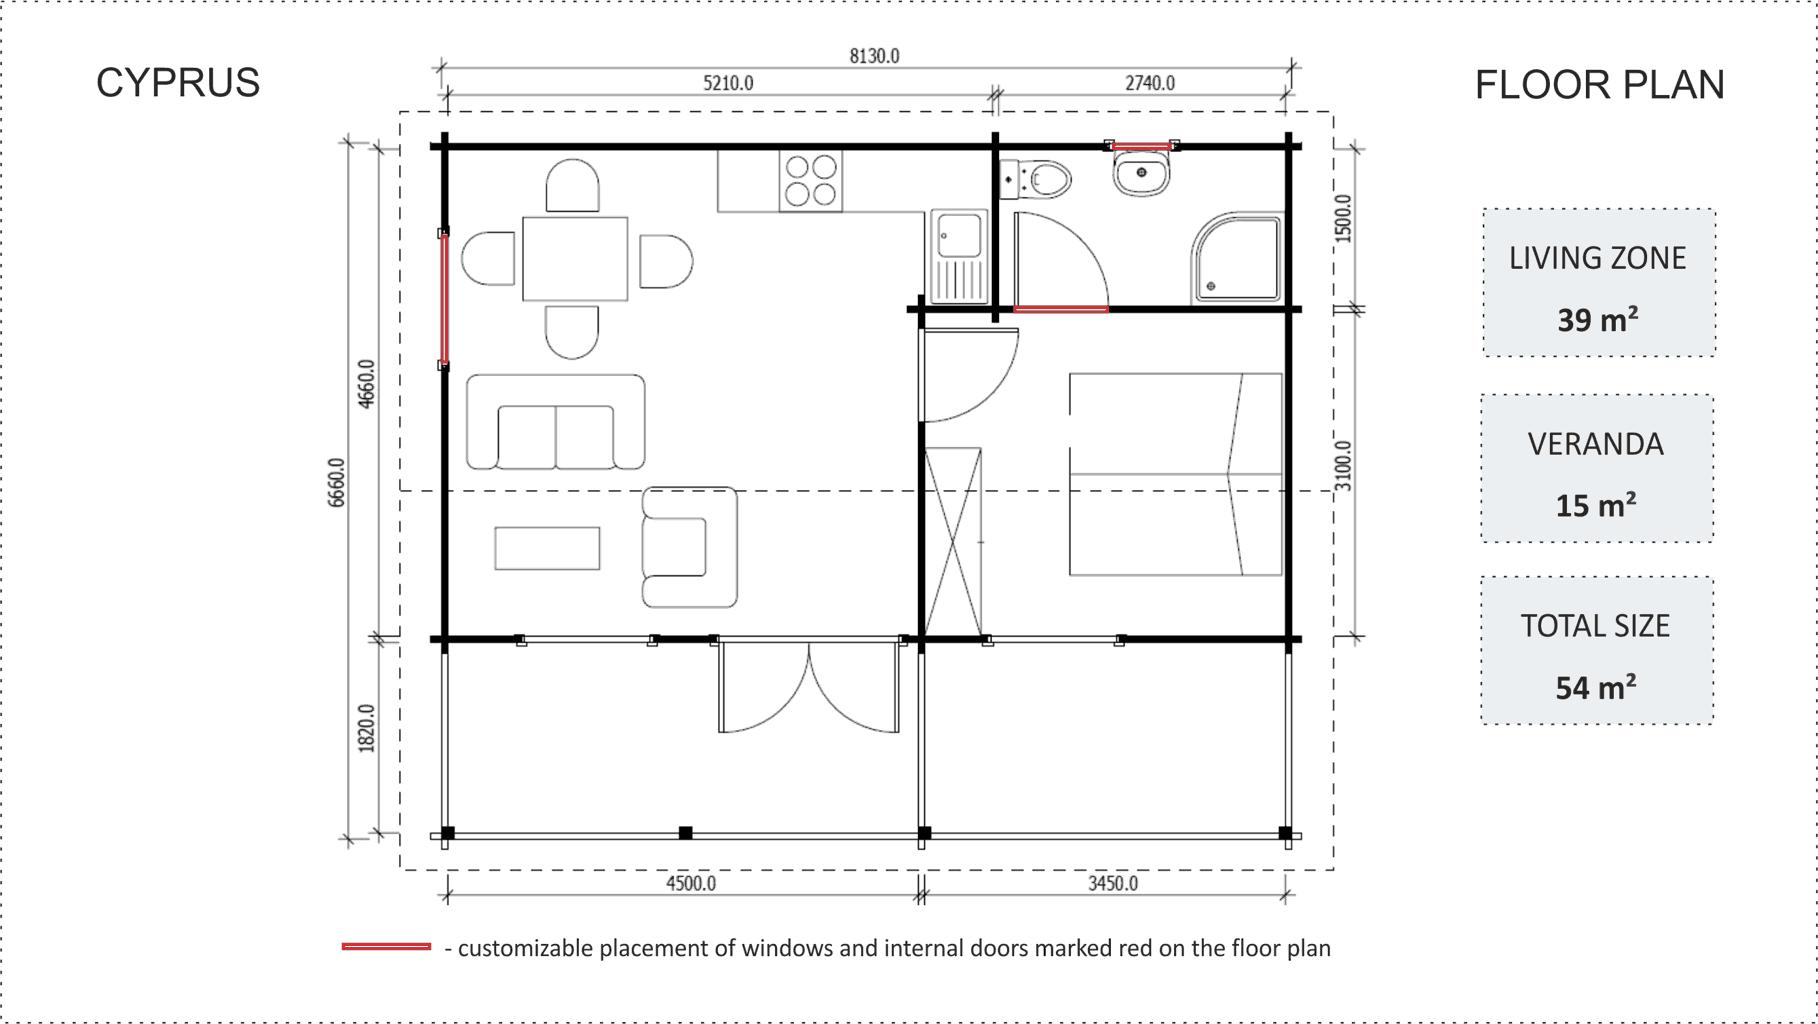 Granny flat Cyprus floor plan